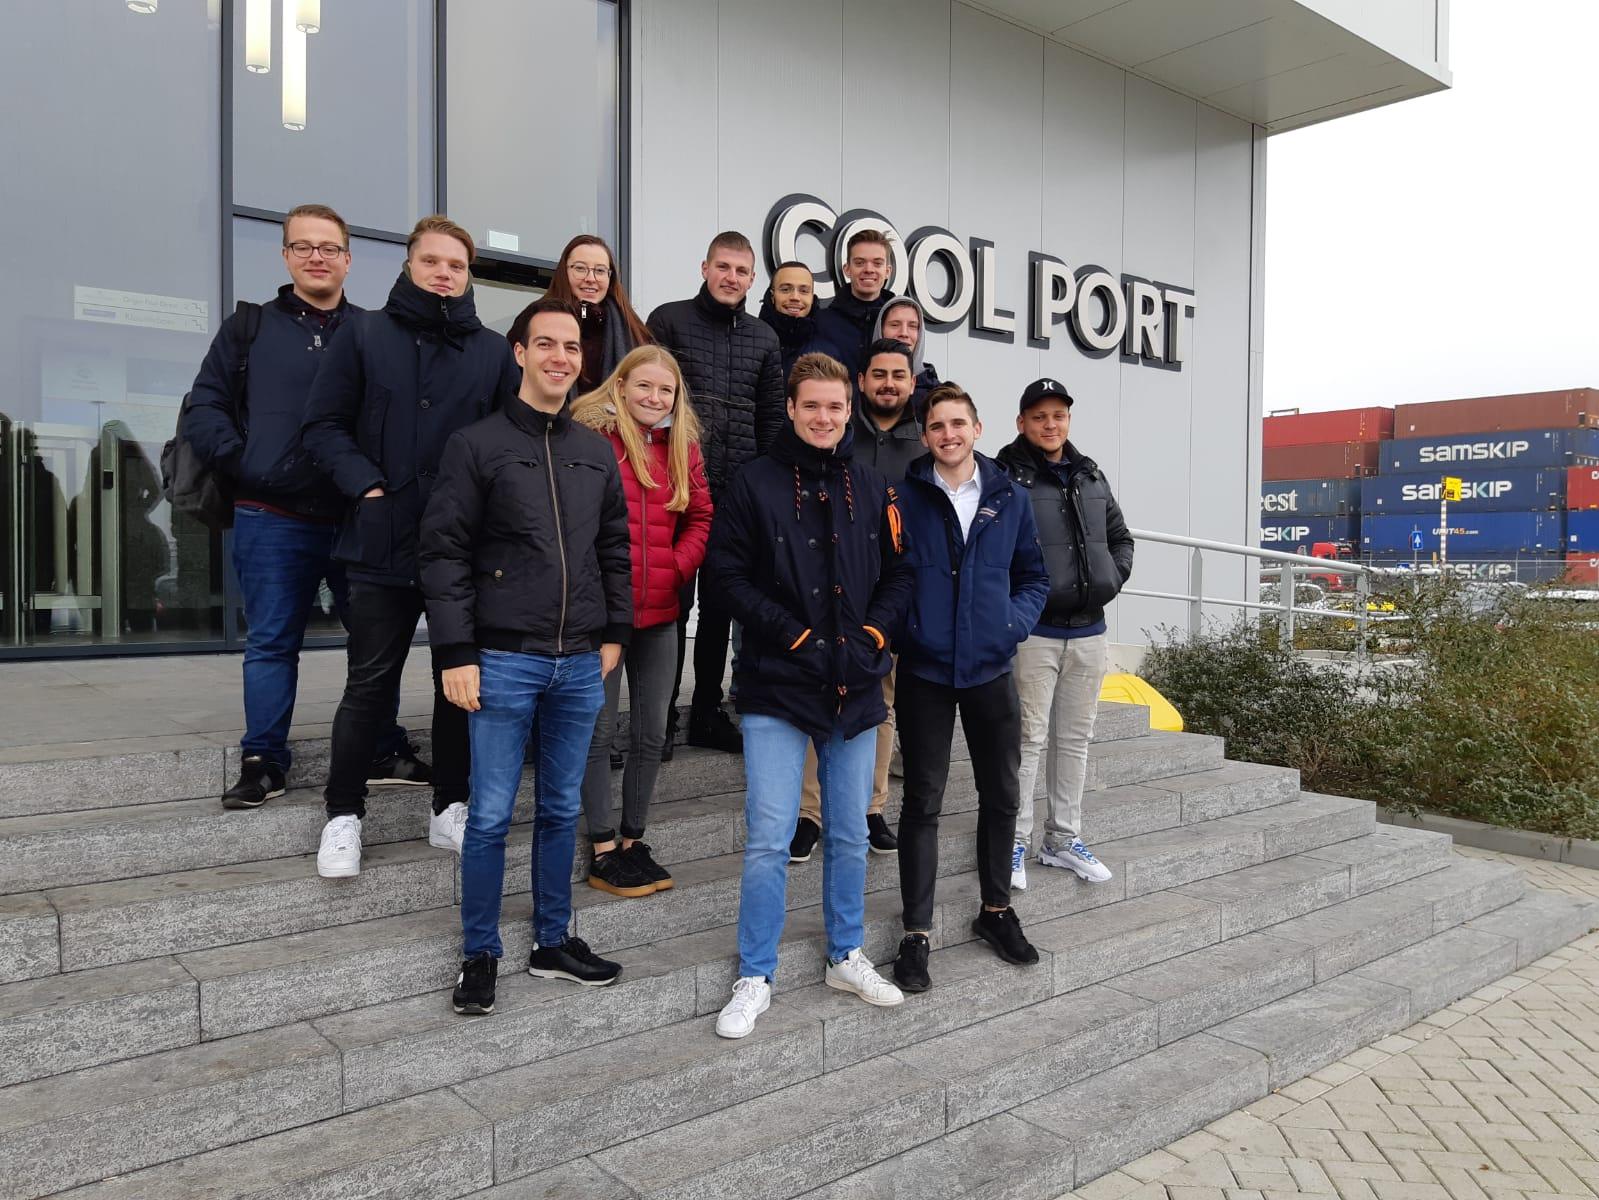 Excursie Kloosterboer Cool Port B.V.